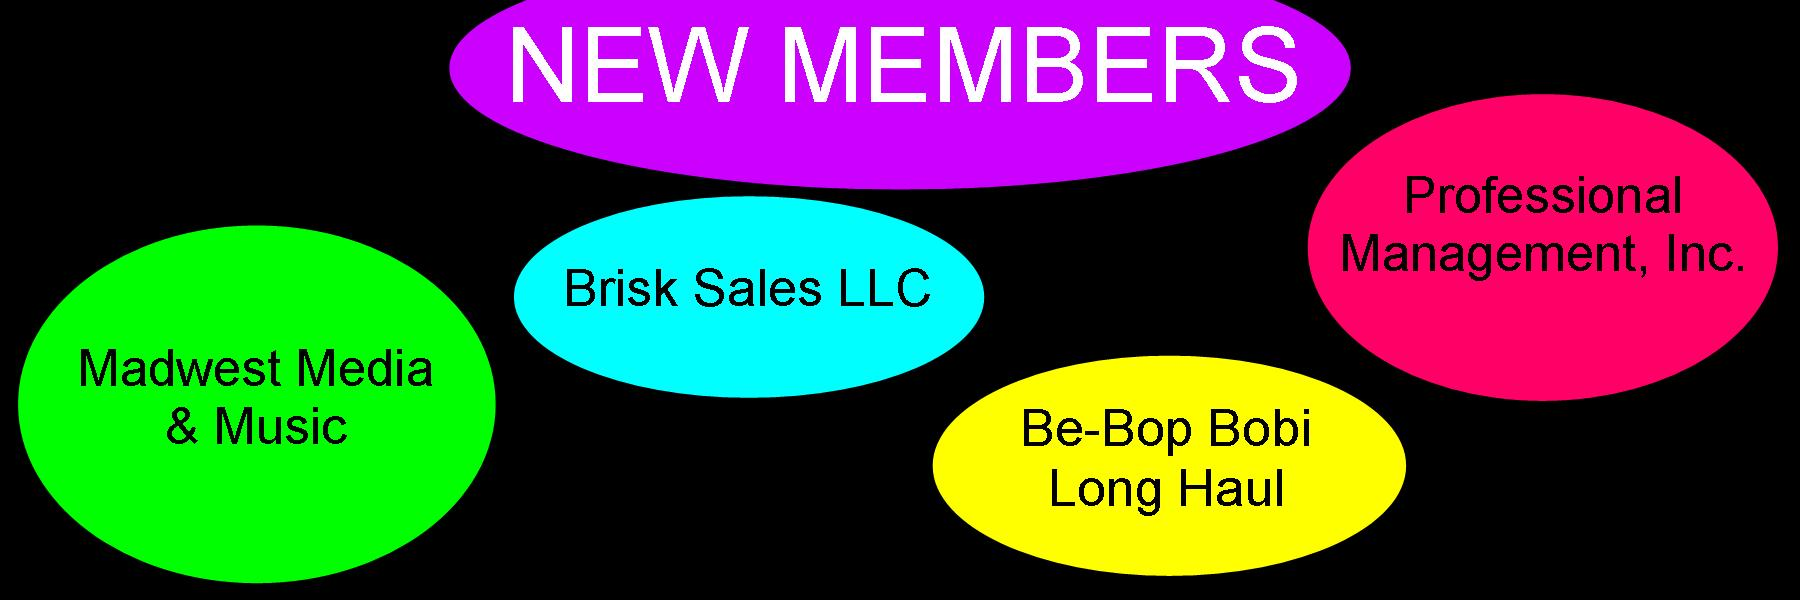 New--Members-6-20-17.jpg